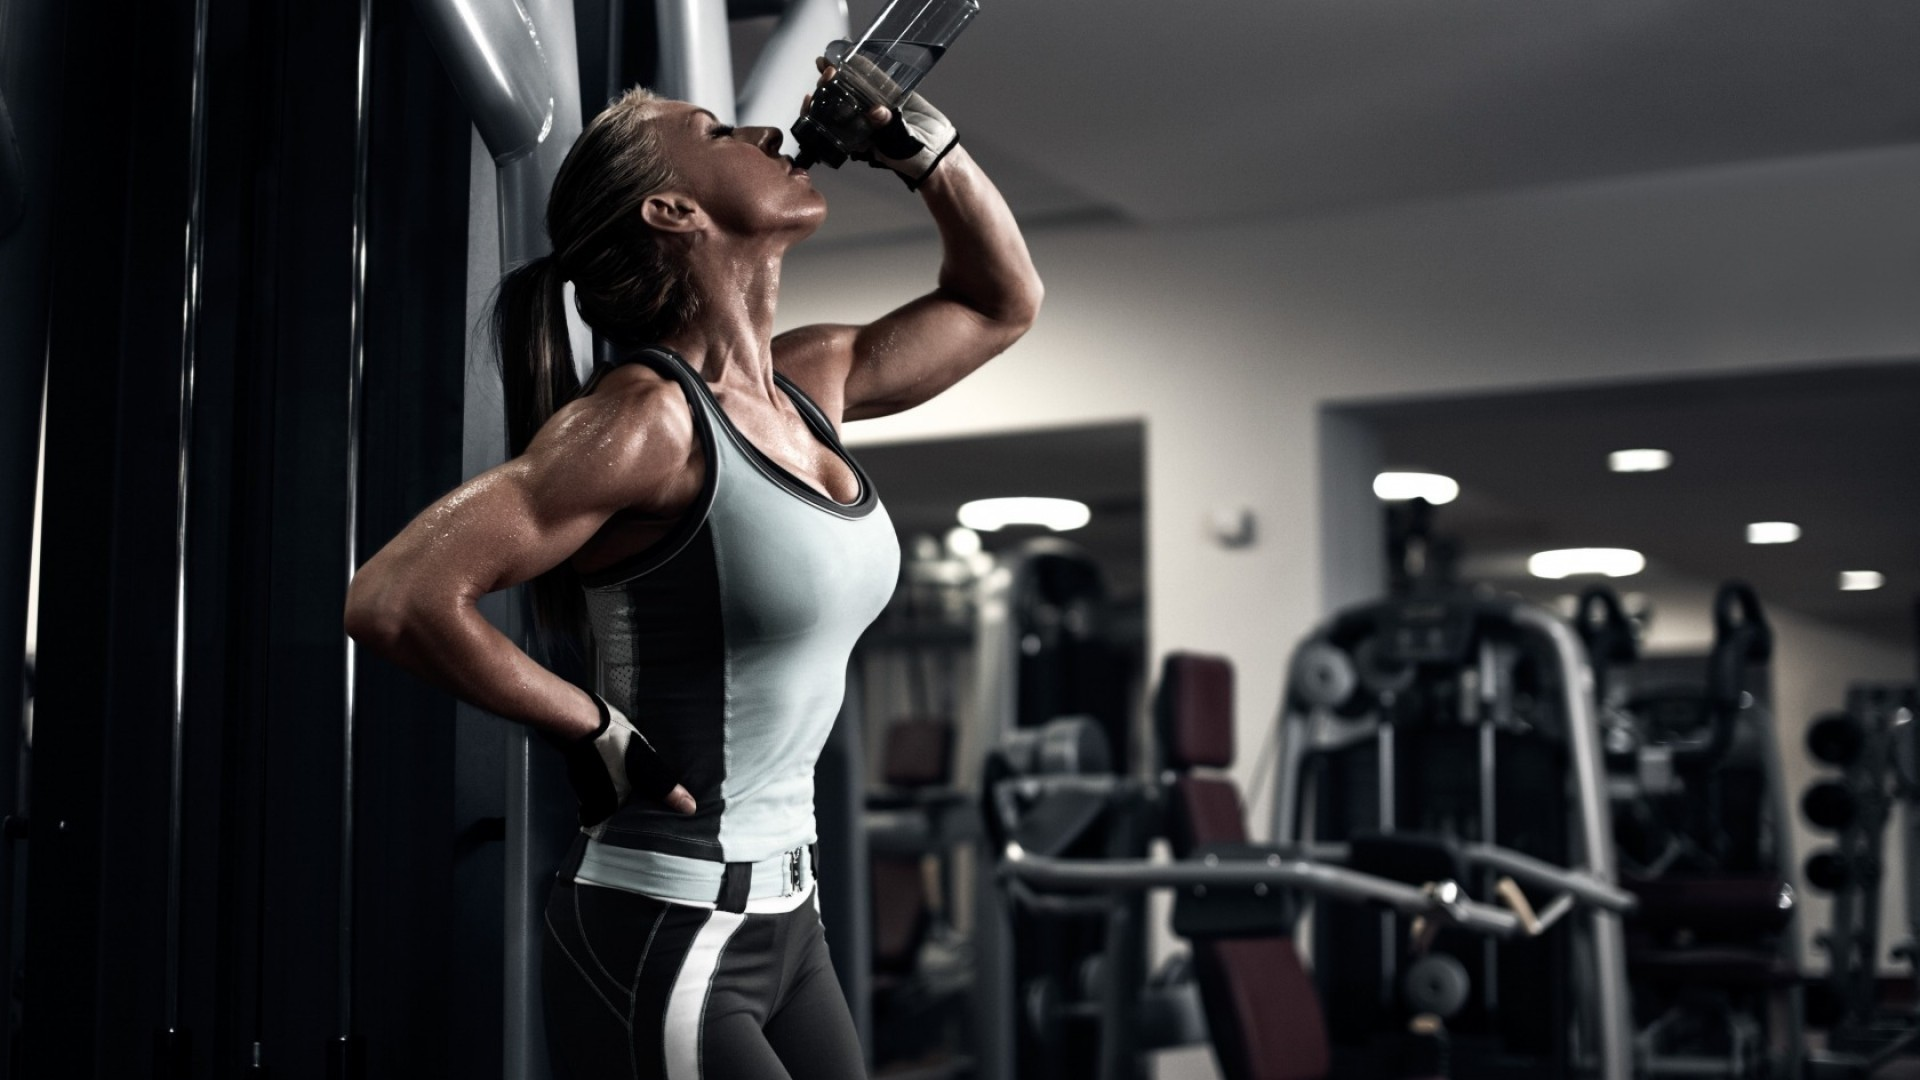 Fitness Background Wallpaper